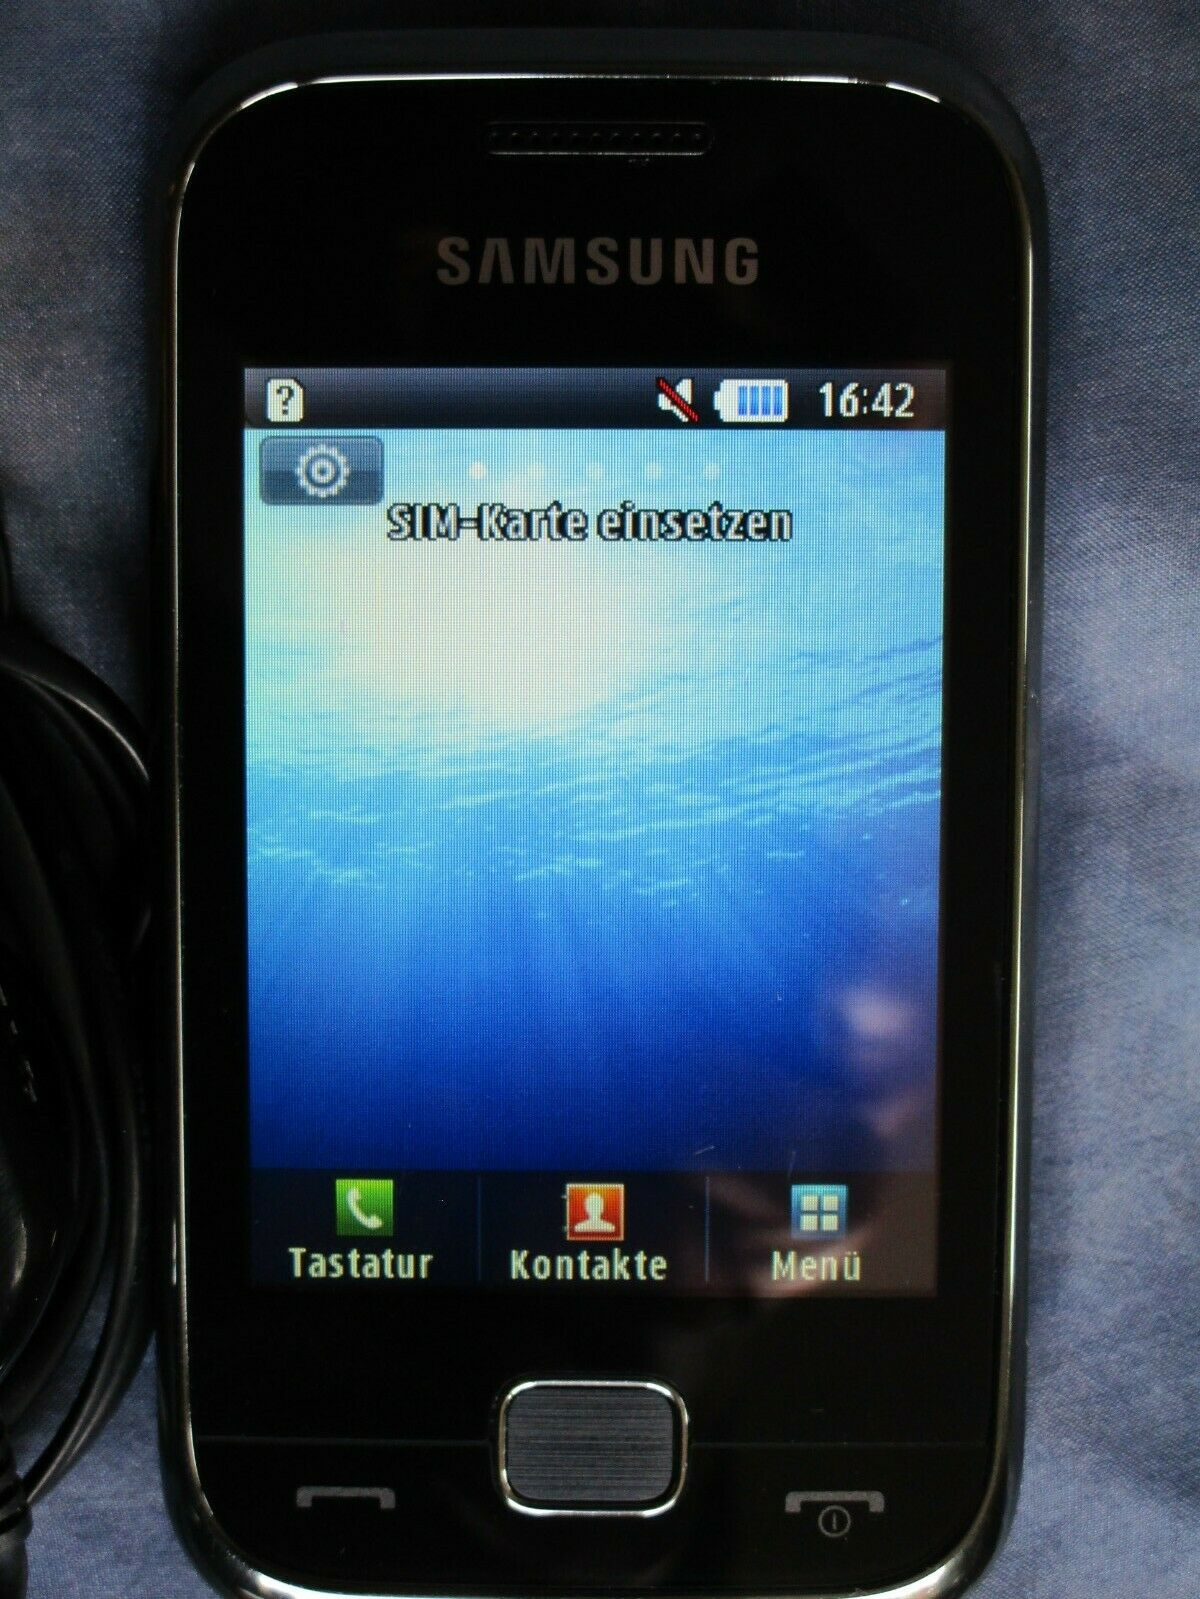 Samsung Handy Smartphone GT-C3310 Ohne Simlock